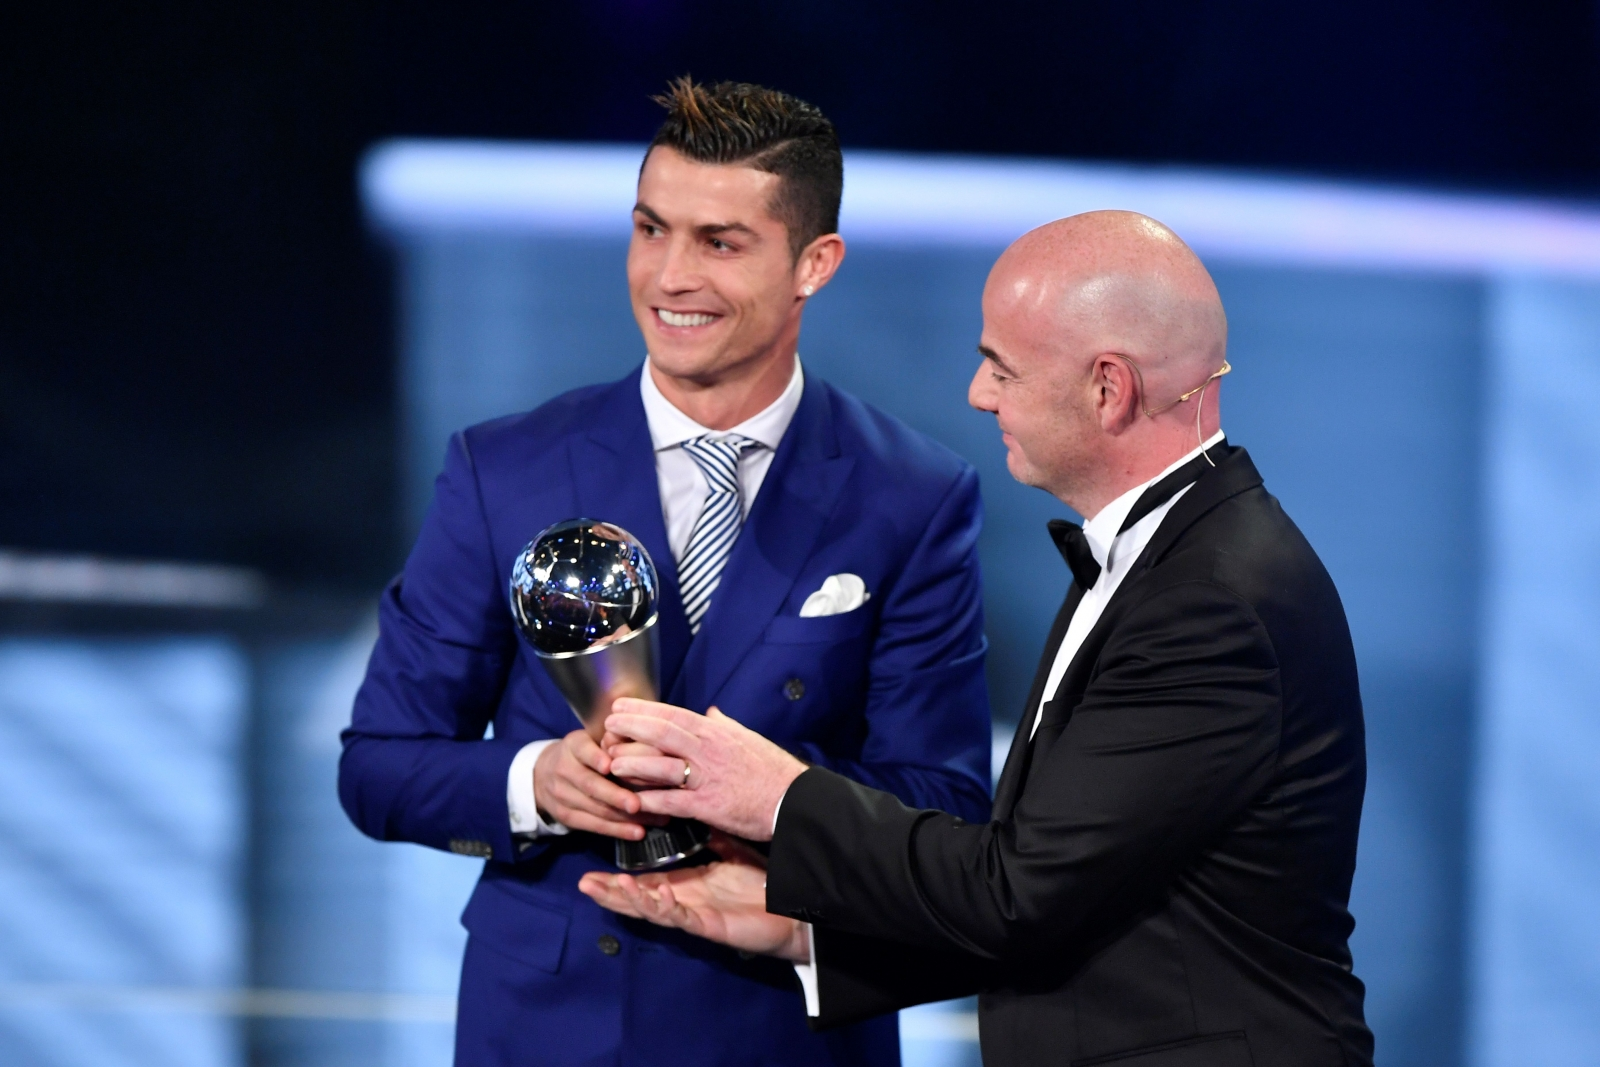 The Best Fifa Football Awards 2016  Cristiano Ronaldo beats Lionel ... e6bdc81f812e6